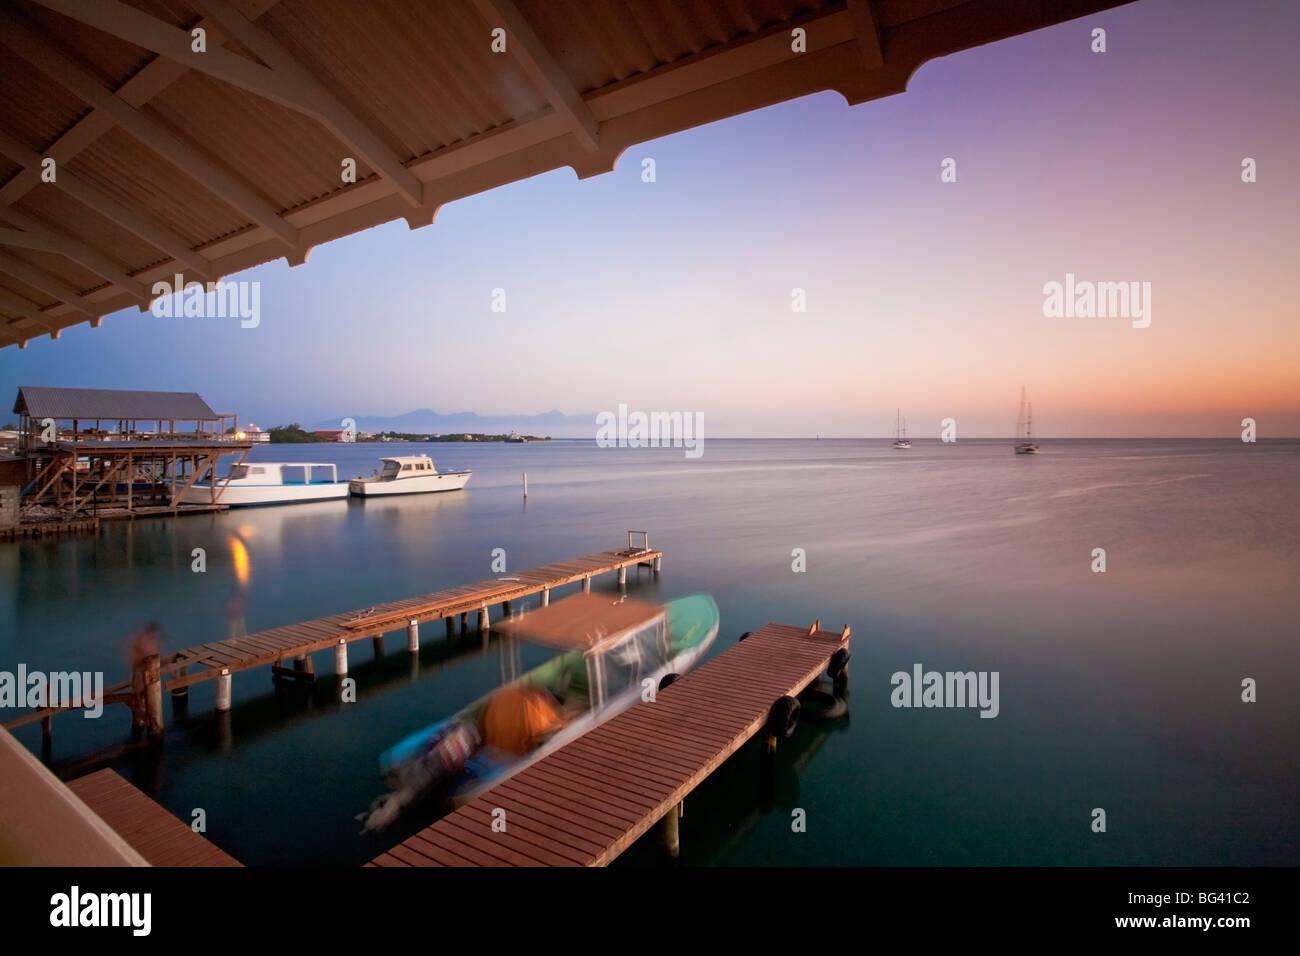 Le Honduras, Bay Islands, Utila, Cafe Mariposa, Jetty Photo Stock